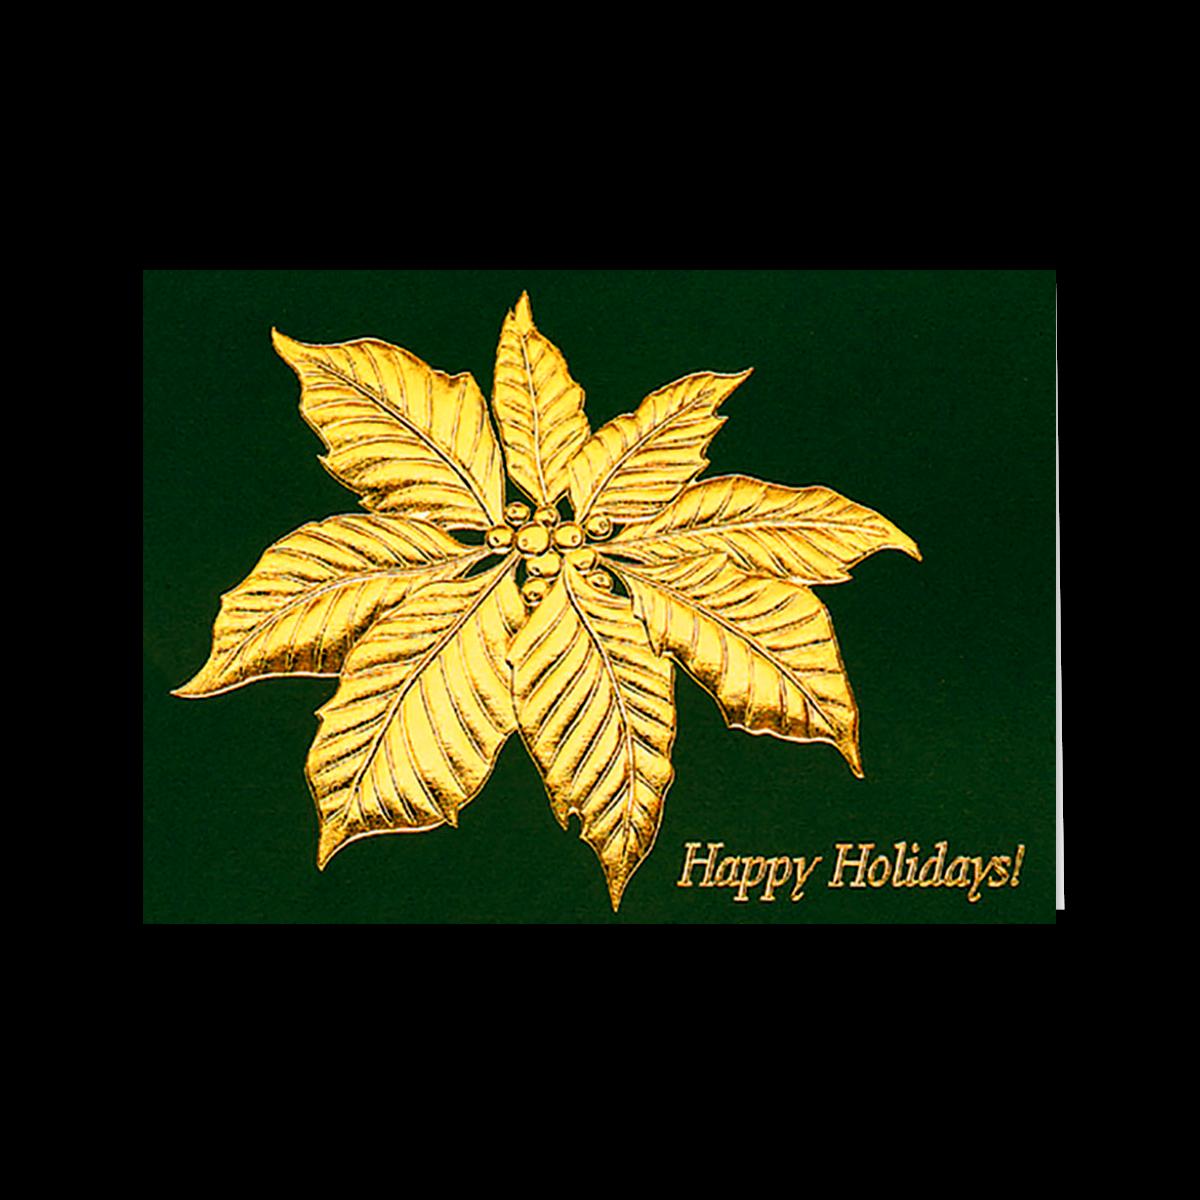 Poinsettia Leaf Greeting Card